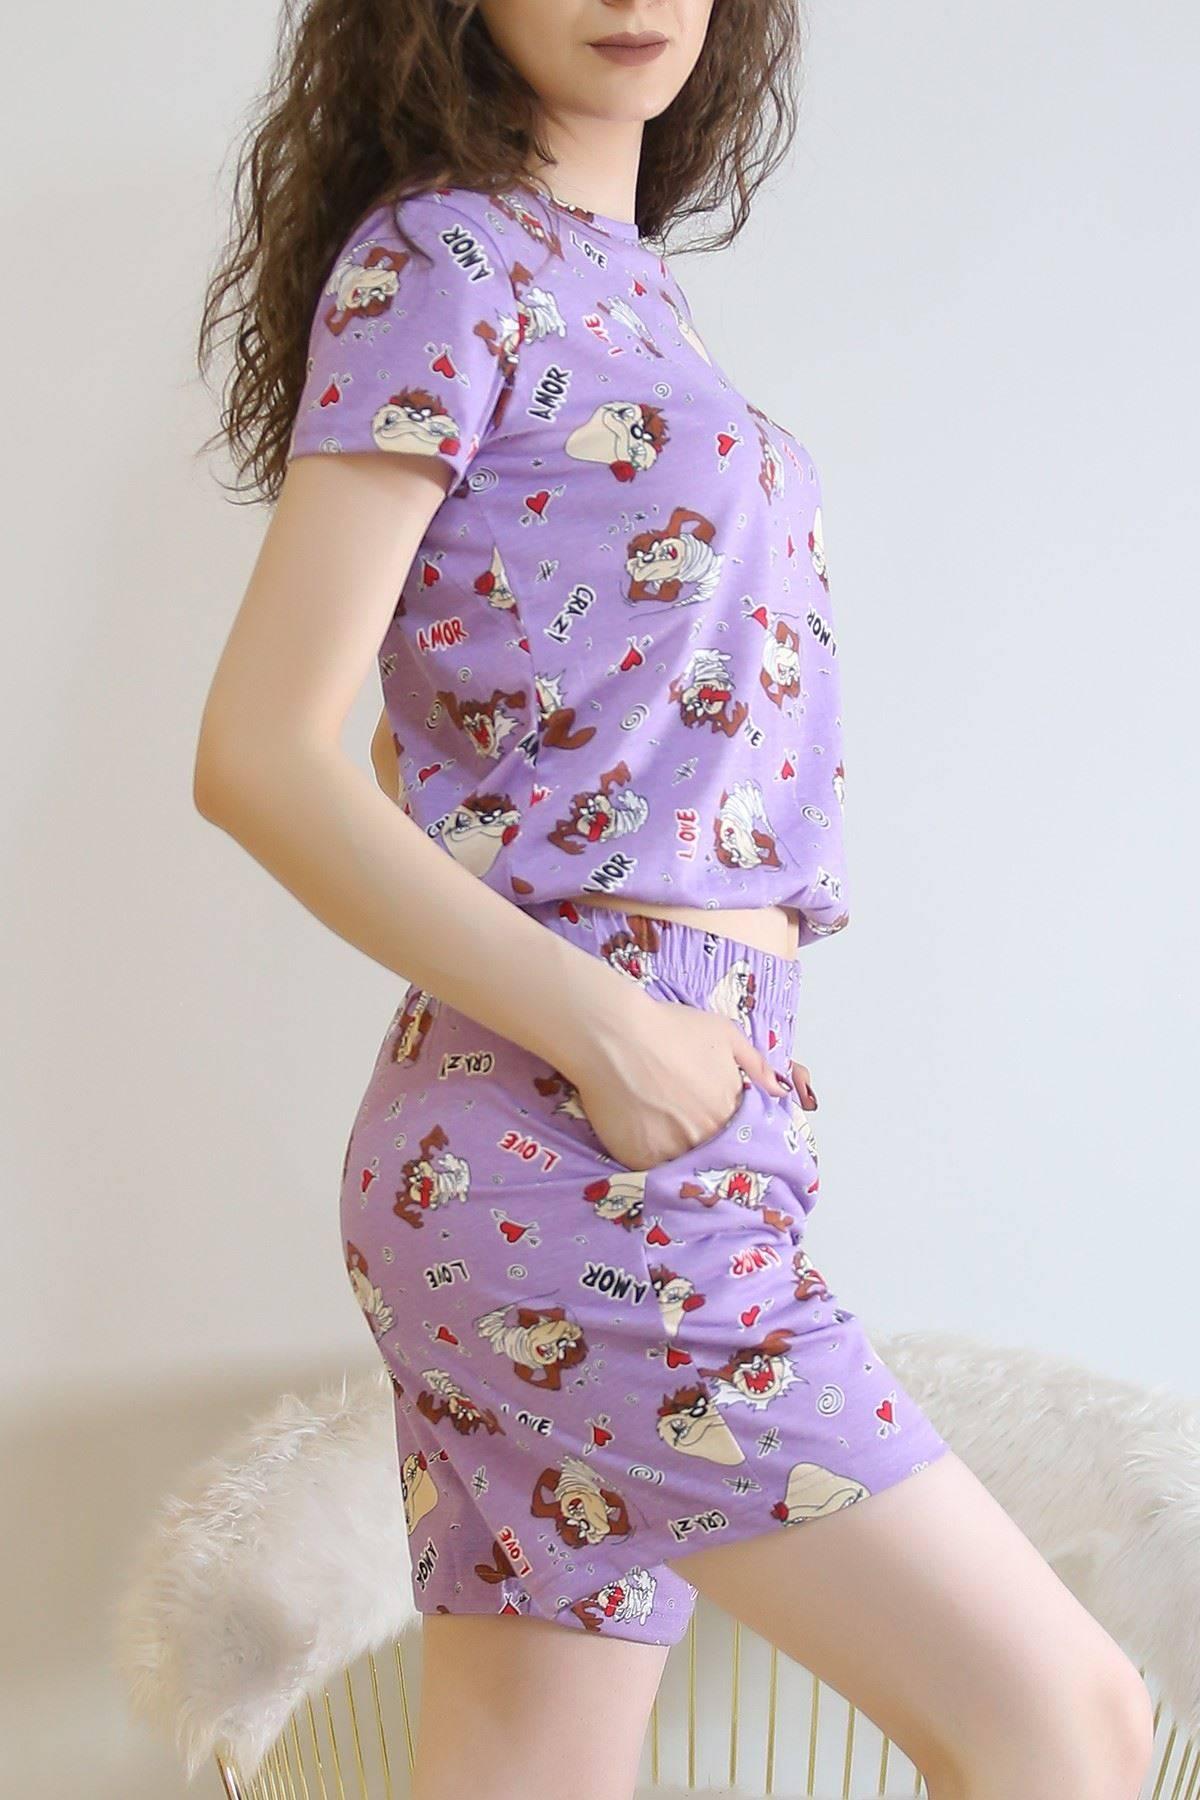 Şortlu Pijama Takımı Leylak - 5924.1059.